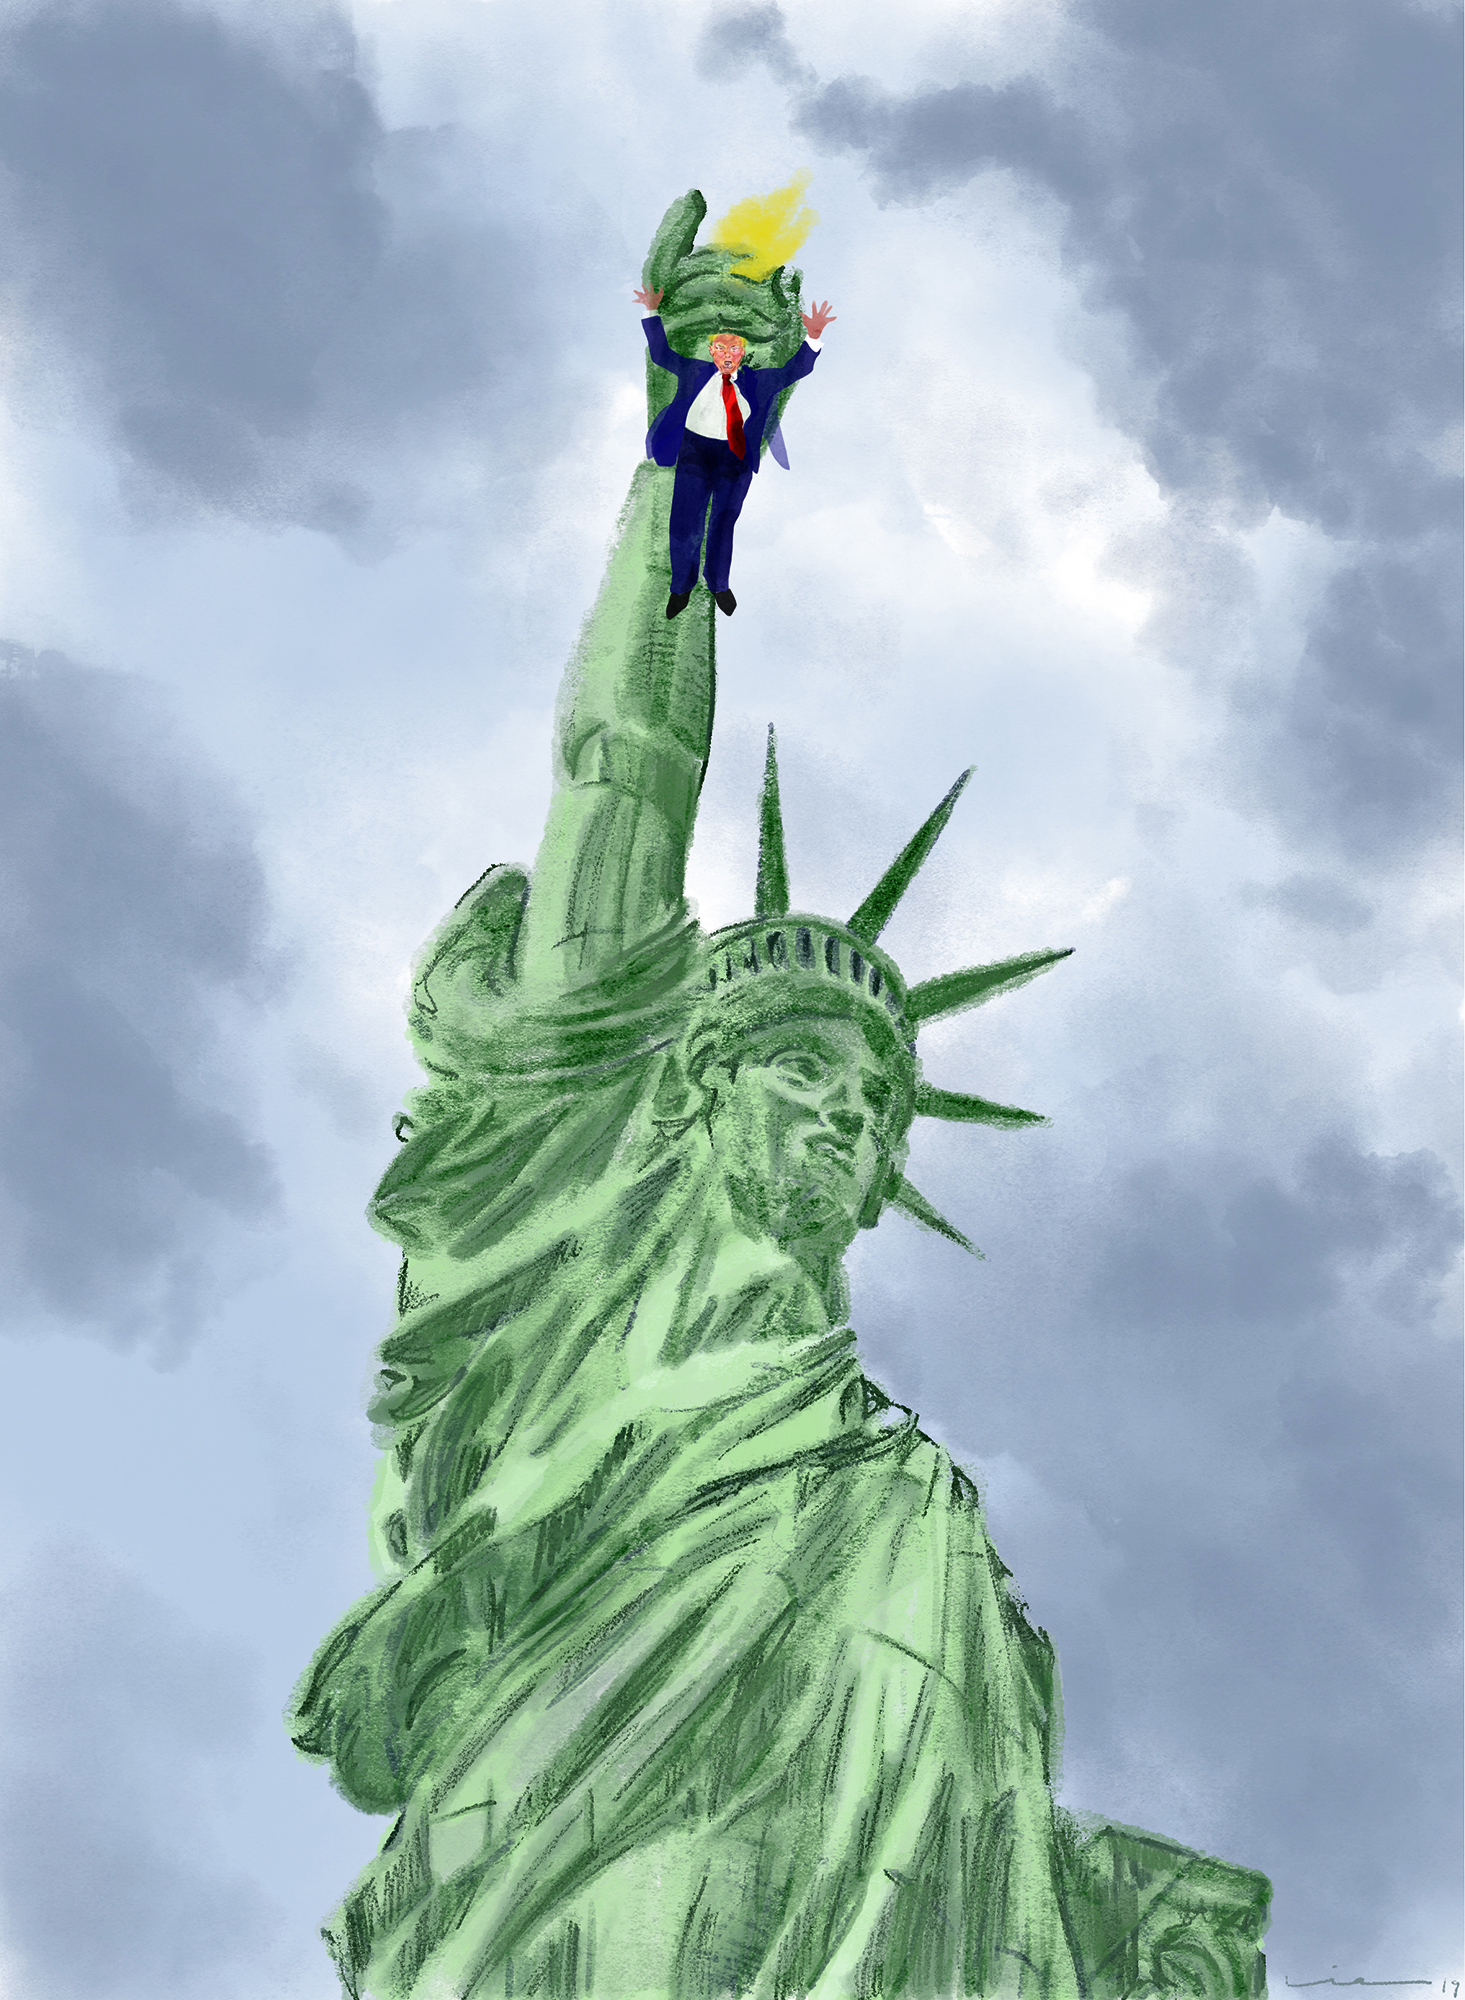 Will America Get Rid of Trump?